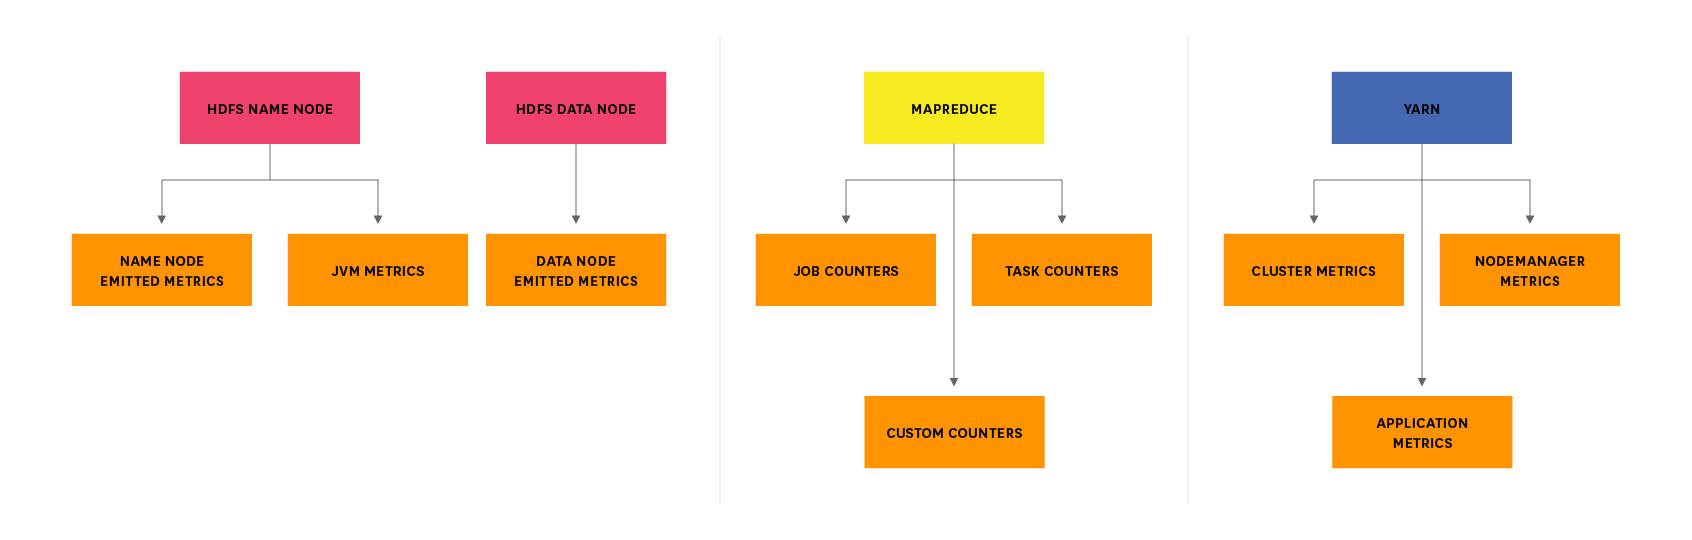 the-monitor/how_to_monitor_hadoop_metrics md at master